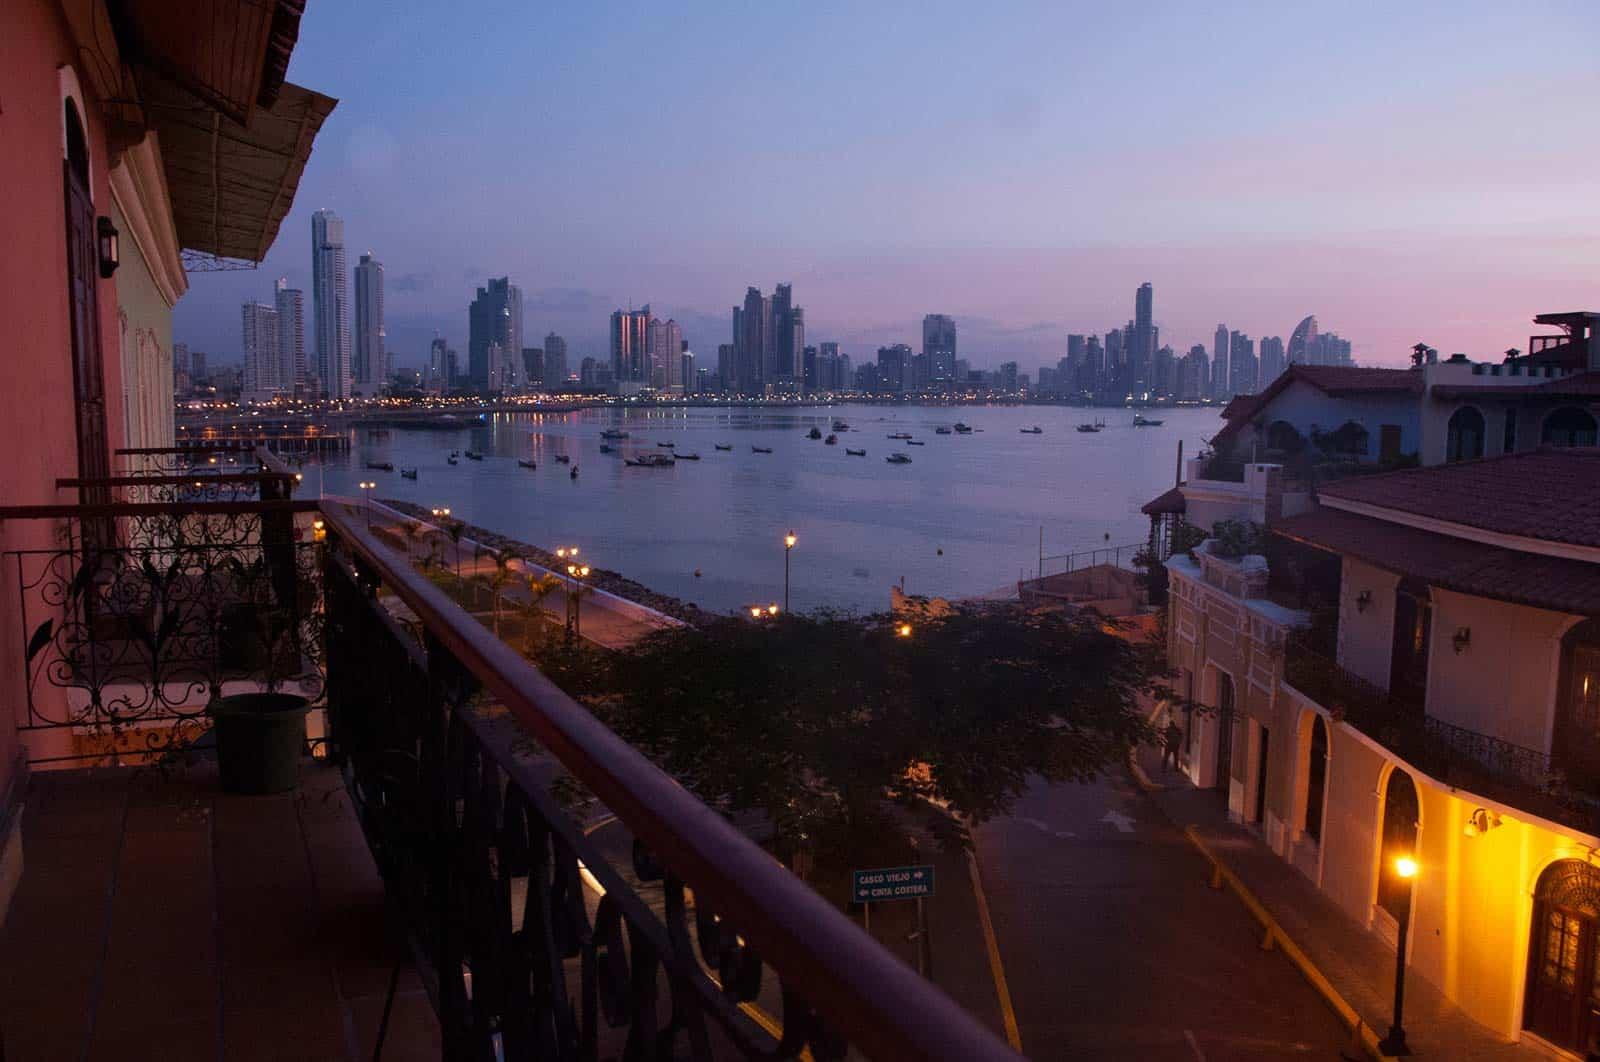 Cidade do Panamá, casco viejo